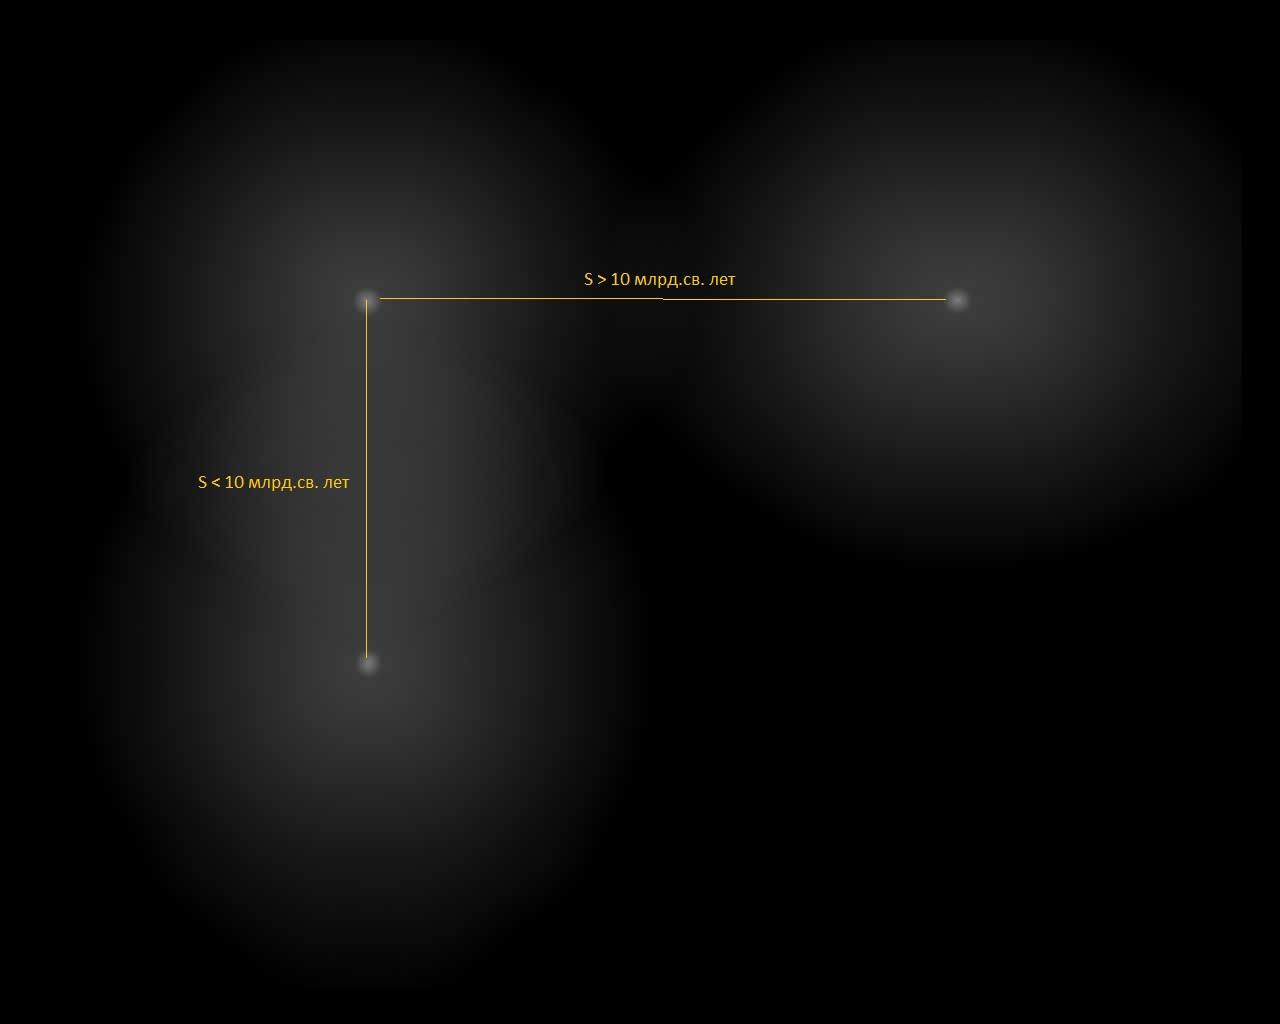 свет-на-расстояние.jpg